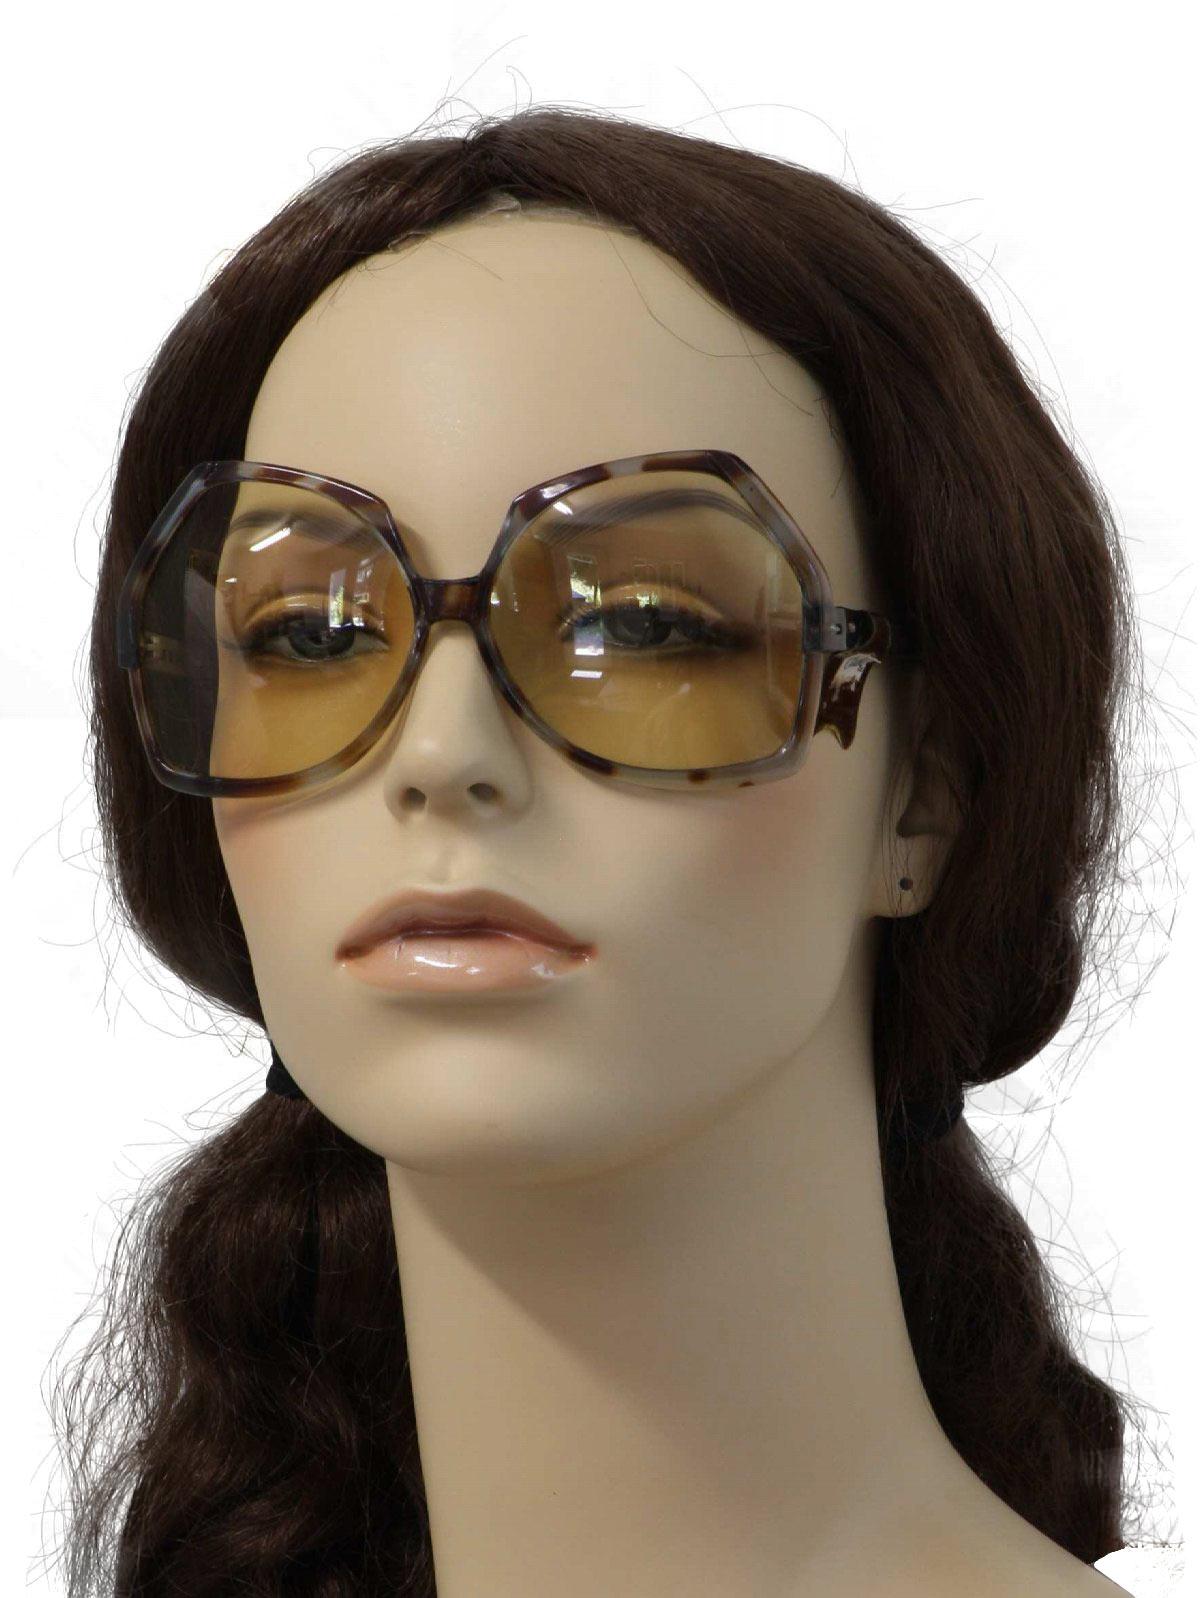 Eyeglasses, Glasses, Eyewear, Prescription Sunglasses